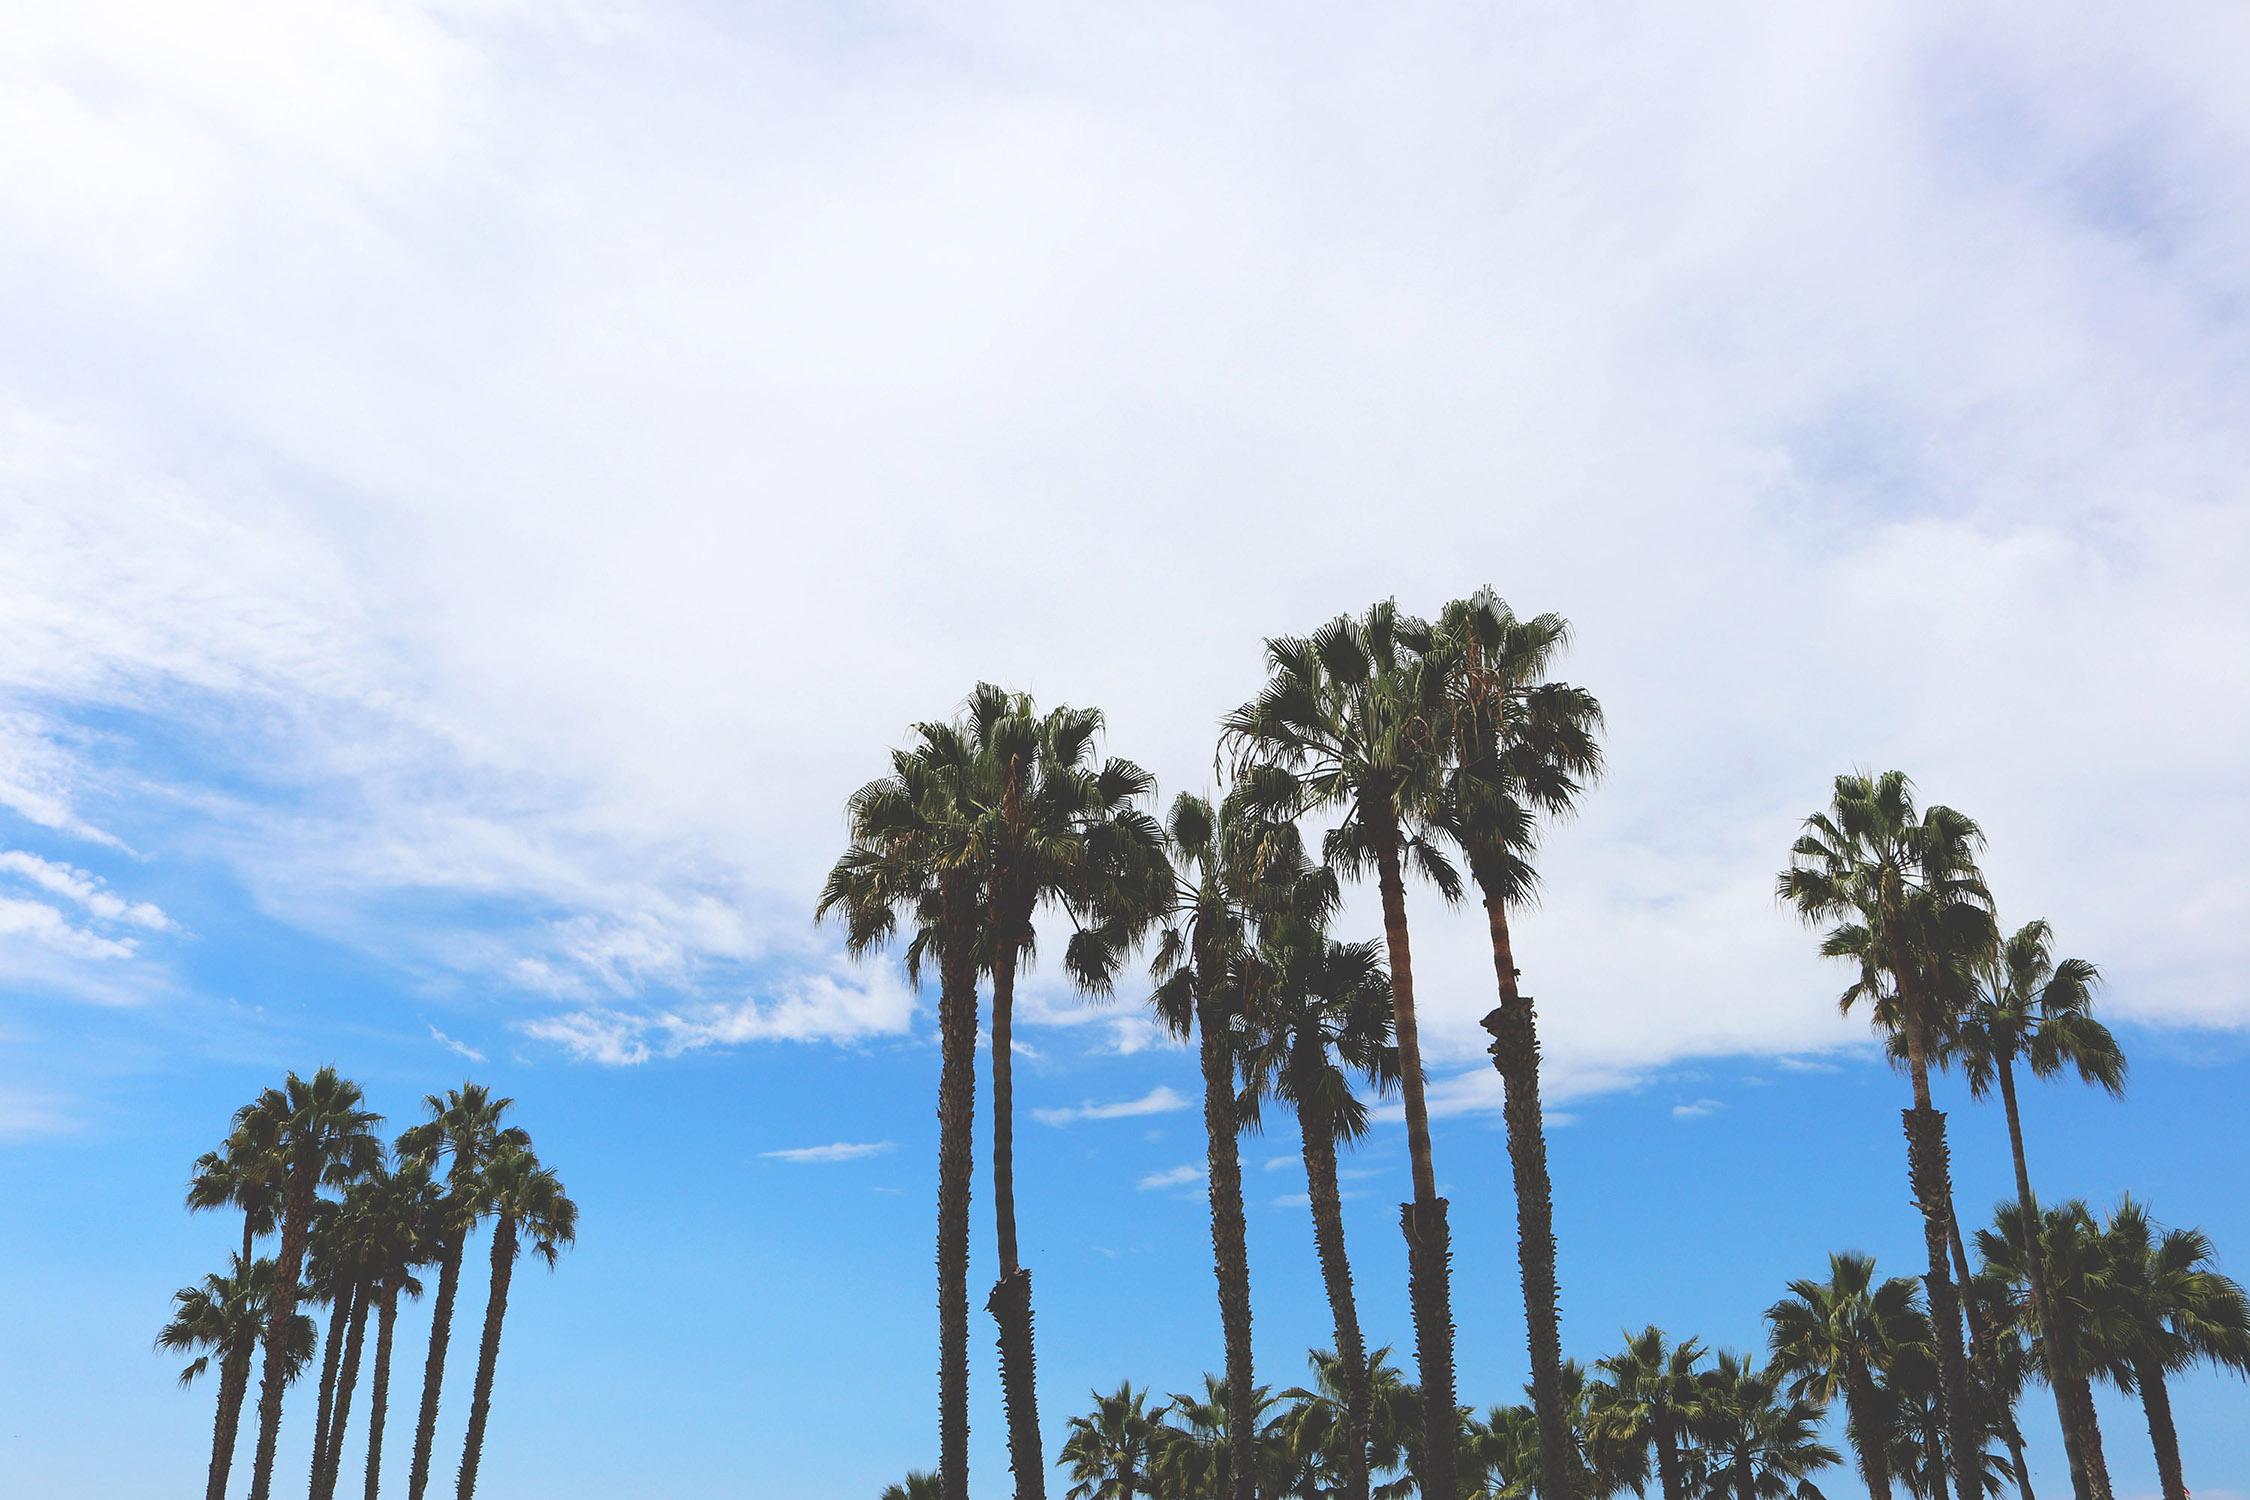 AMERICA PT. 1 – LOS ANGELES